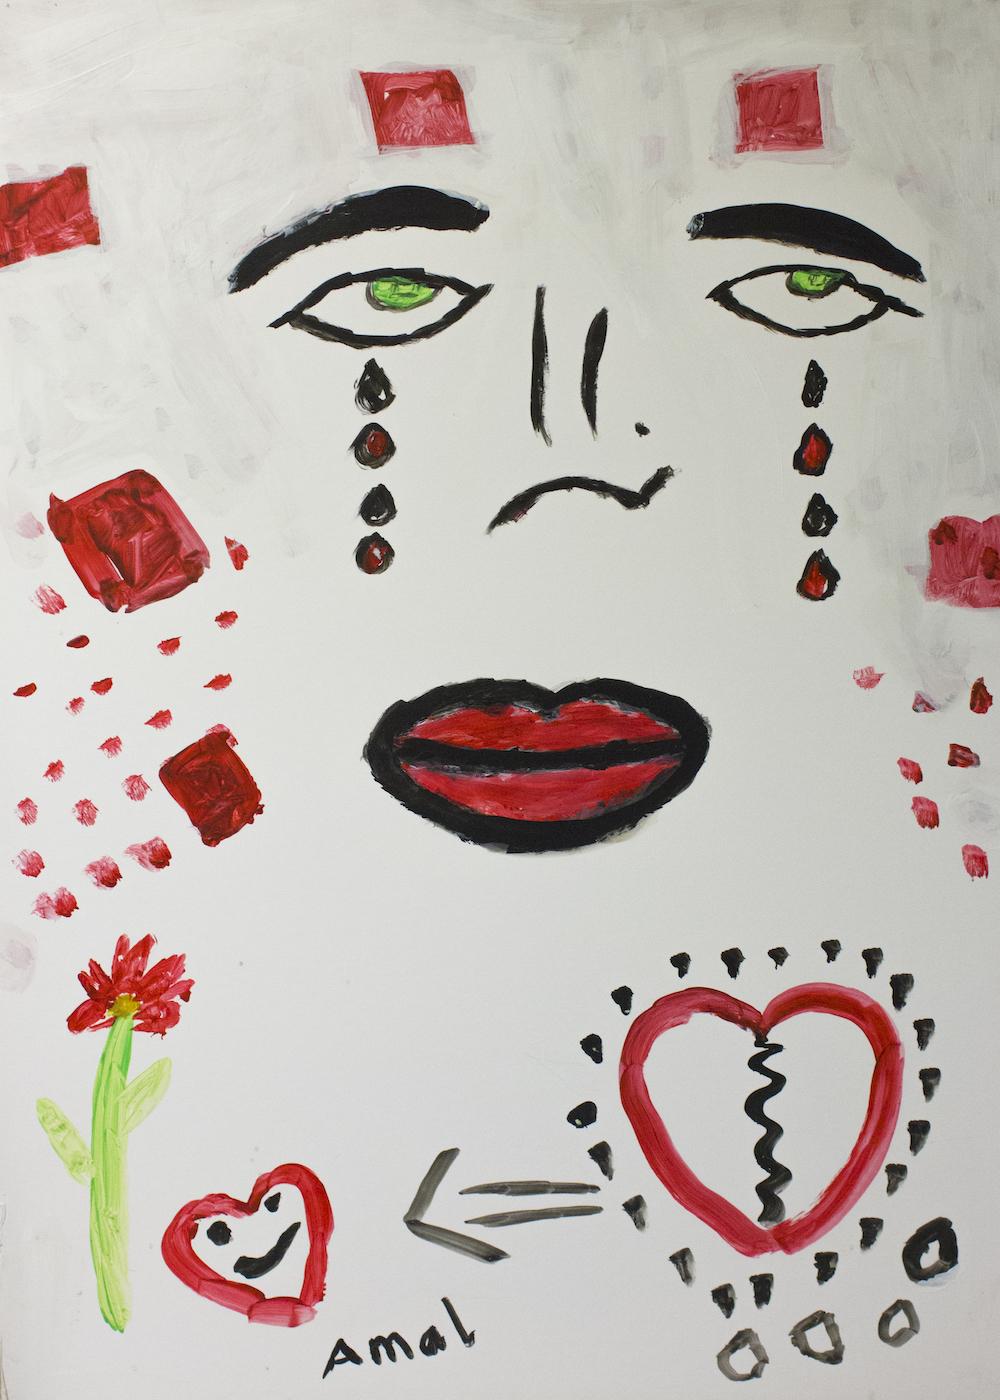 """From sad to be happy"" - Amal, Syria, Lebanon"